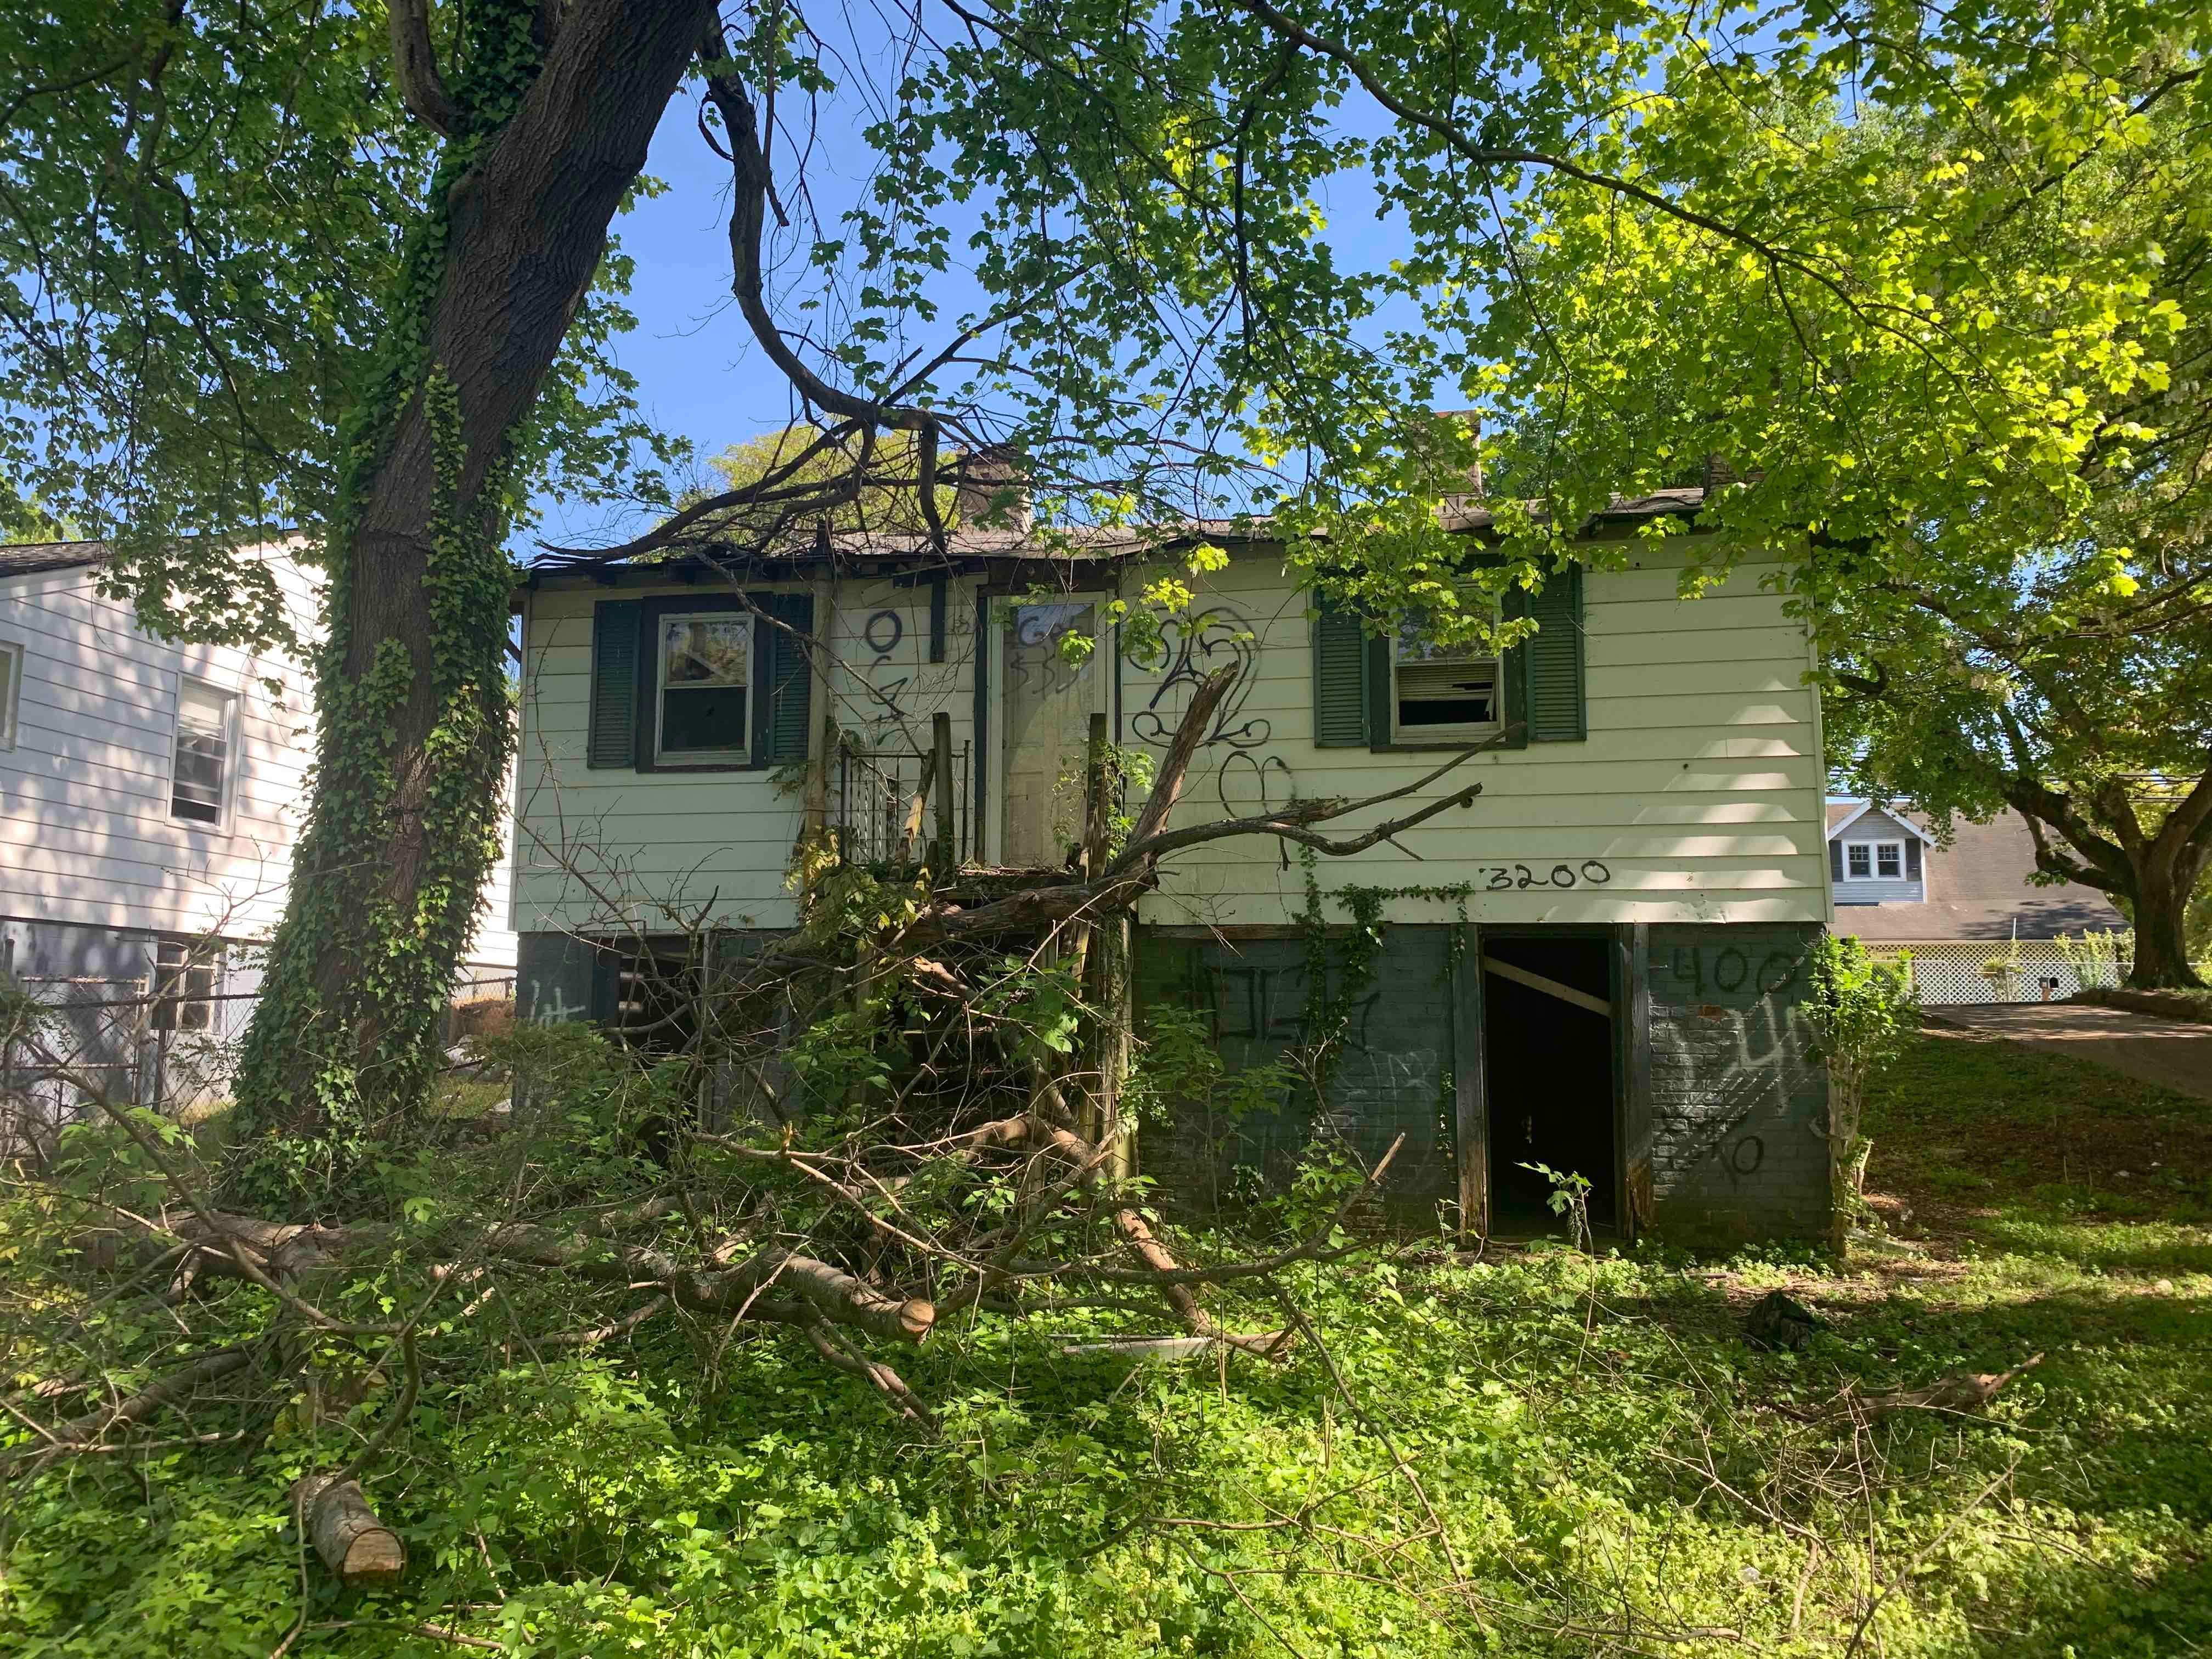 3223 Old Greensboro Rd, Winston Salem, NC